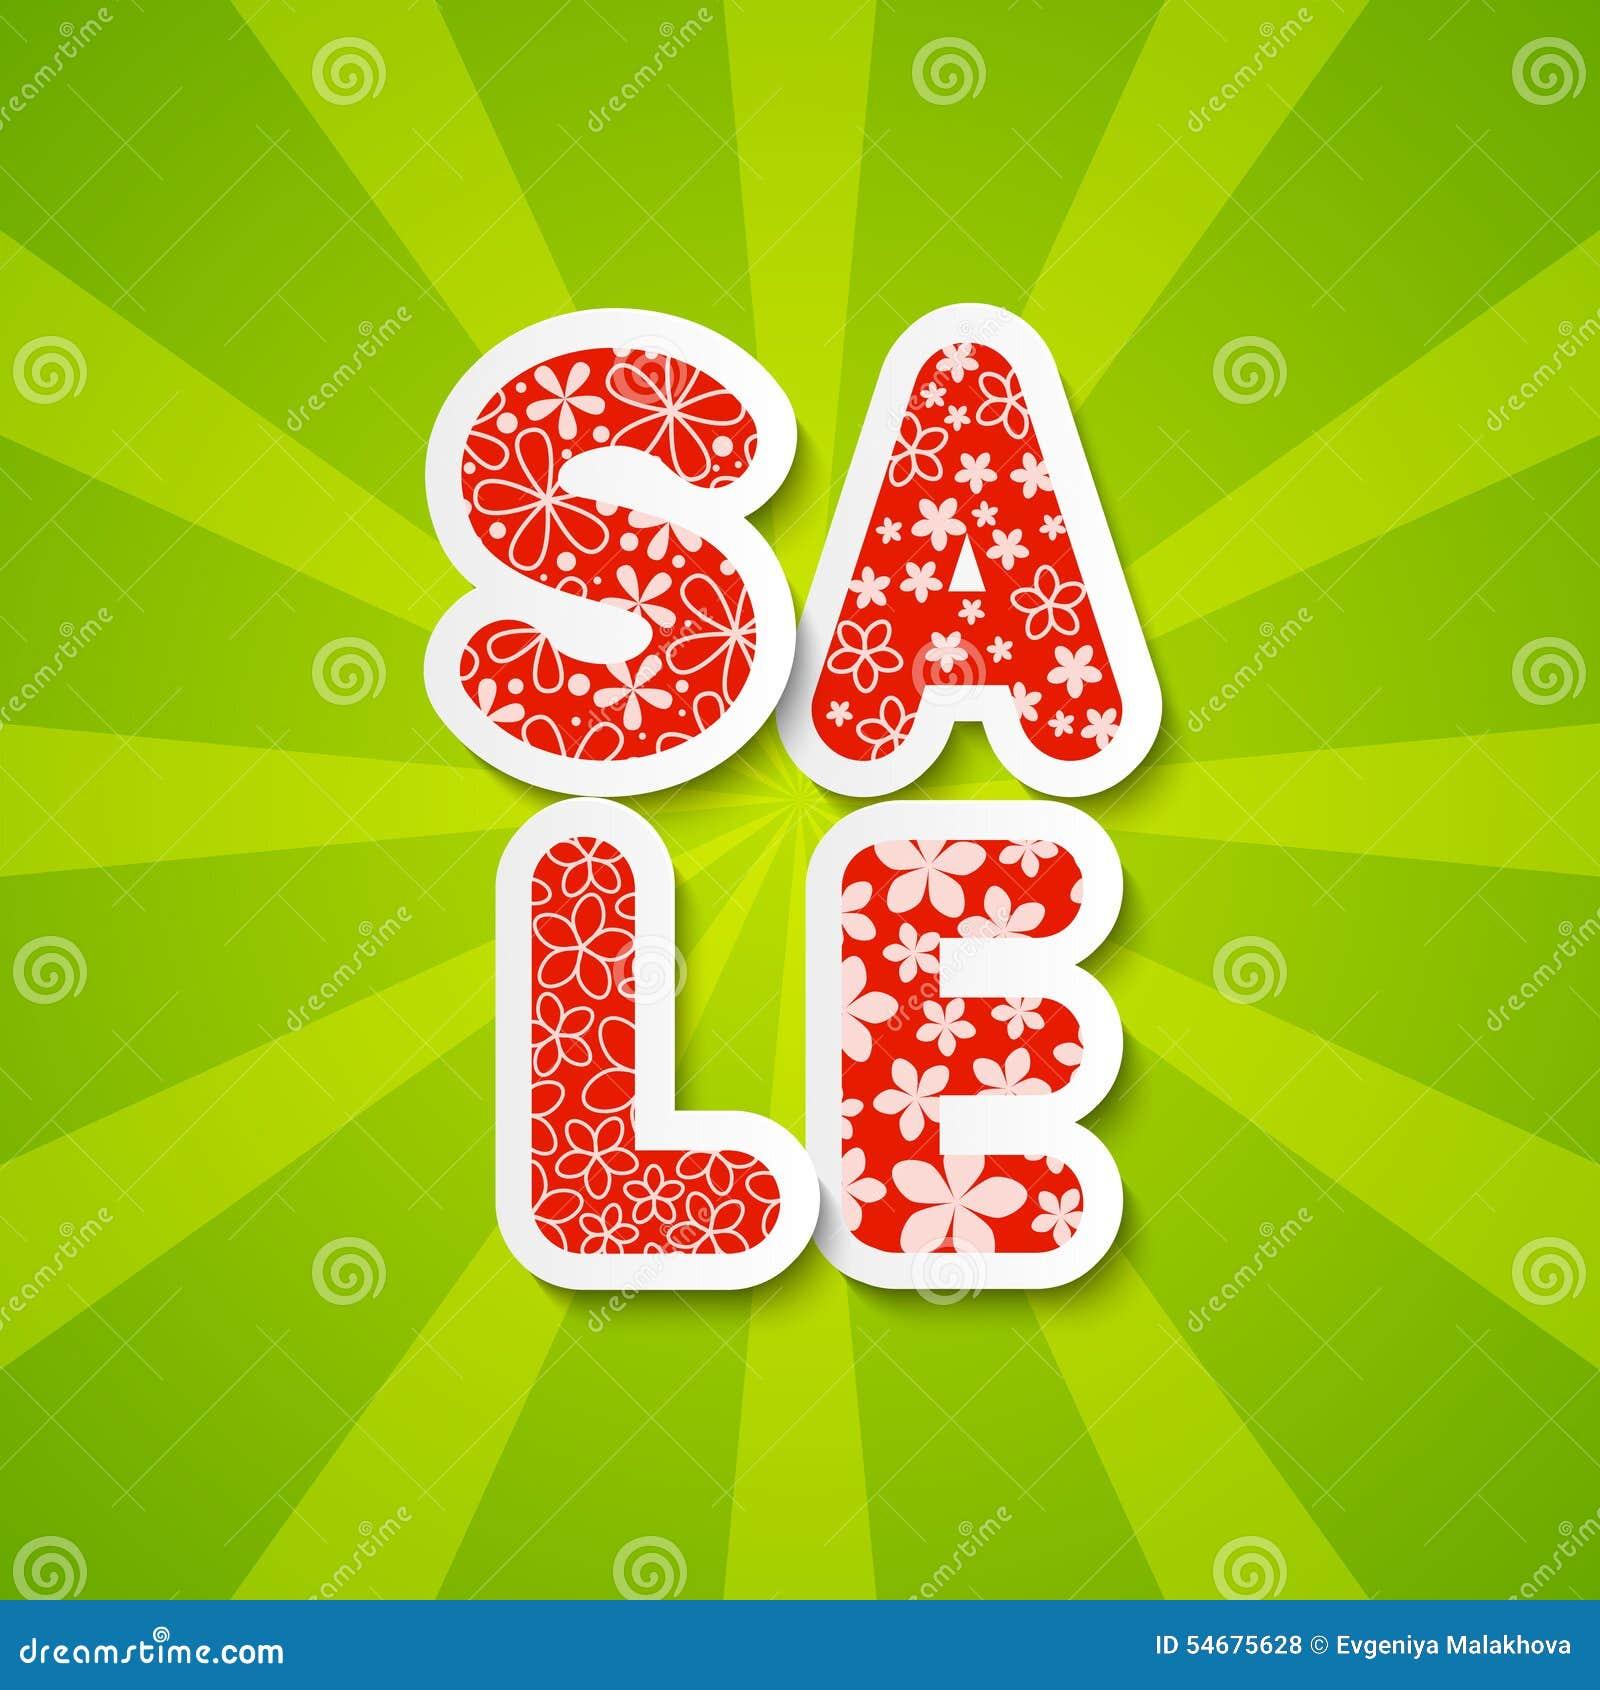 Paper sale